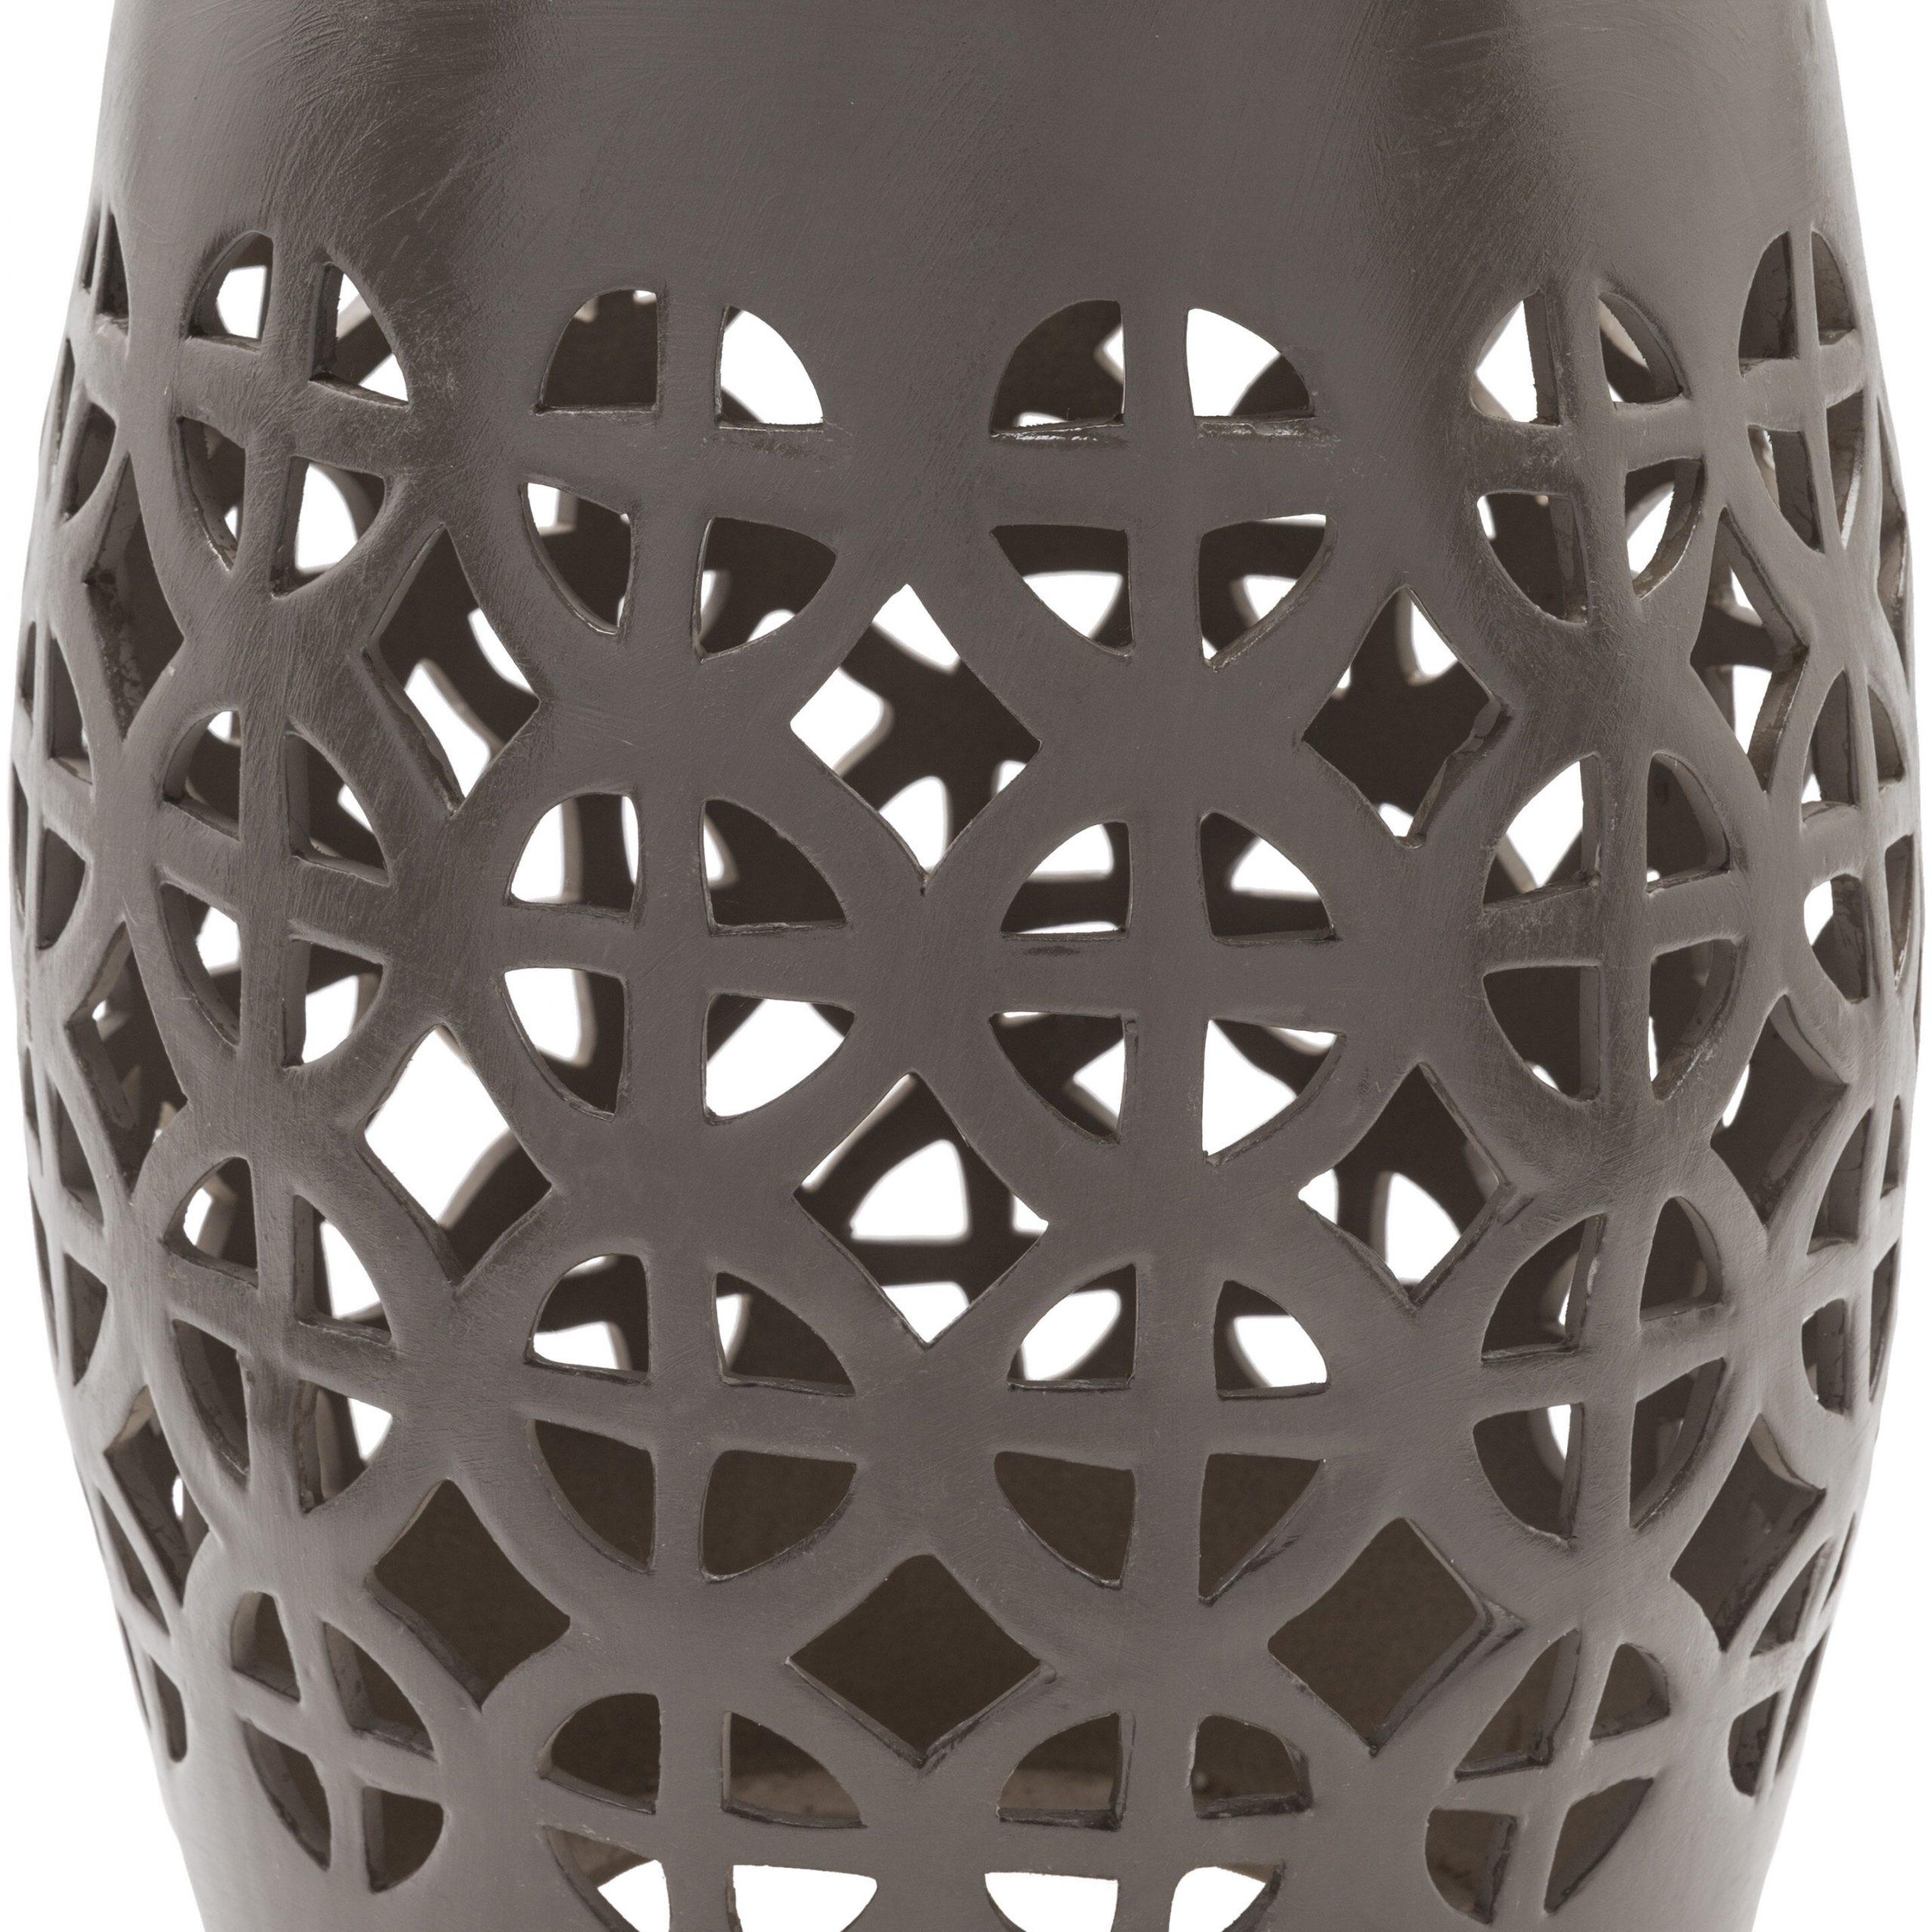 Mistana™ Keswick Garden Stool Regarding Murphy Ceramic Garden Stools (View 25 of 25)